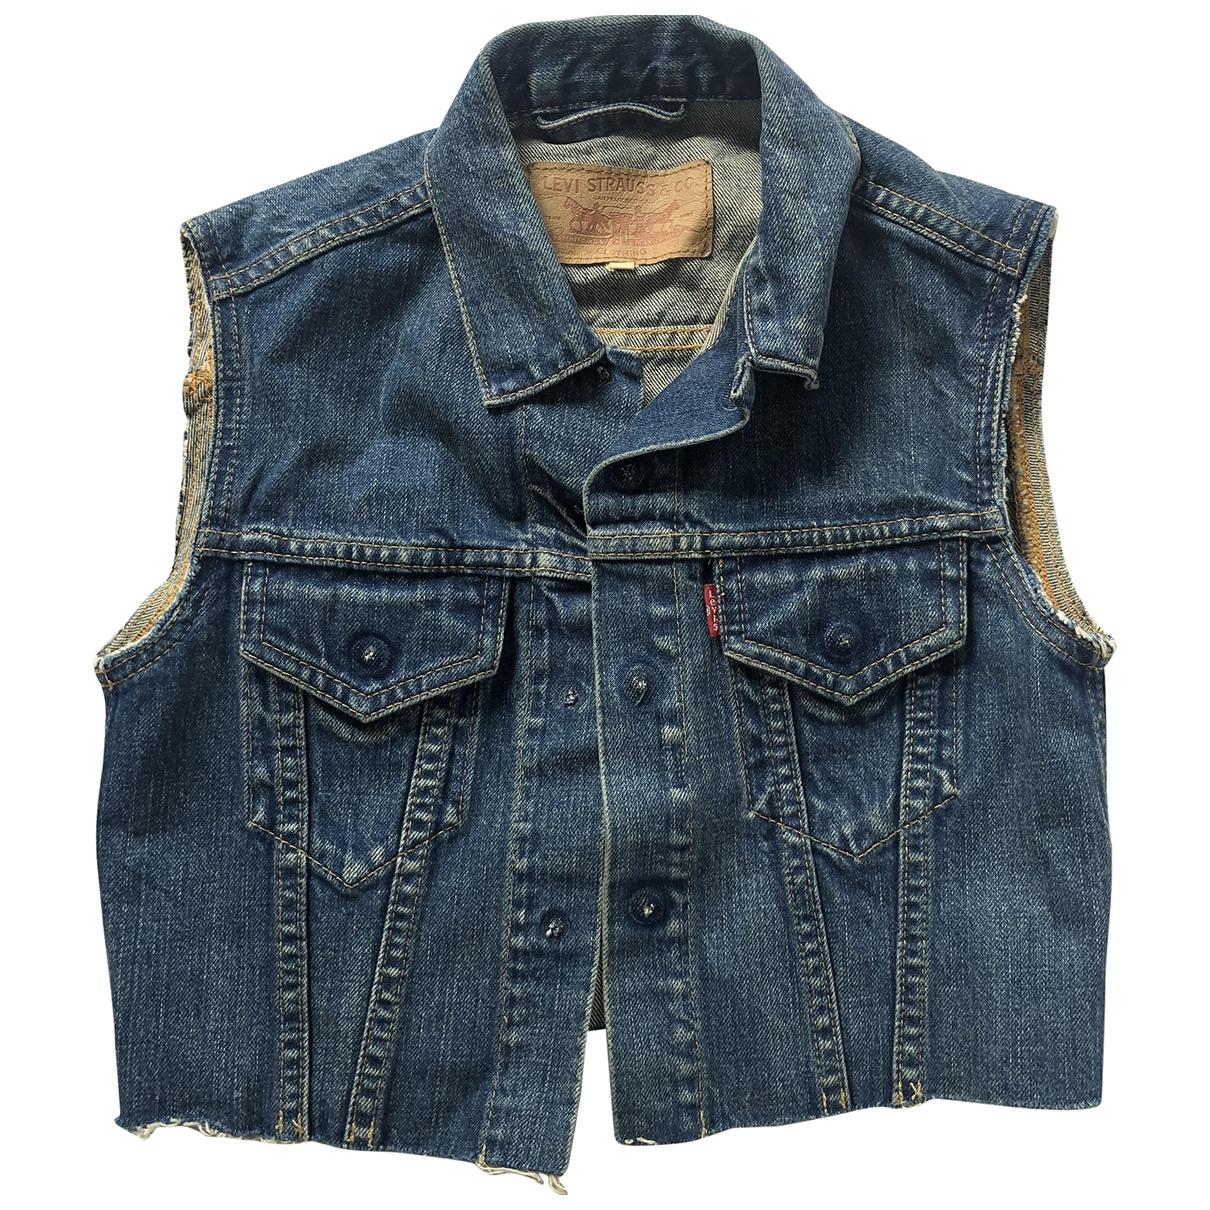 Chaqueta Levis Vintage Clothing